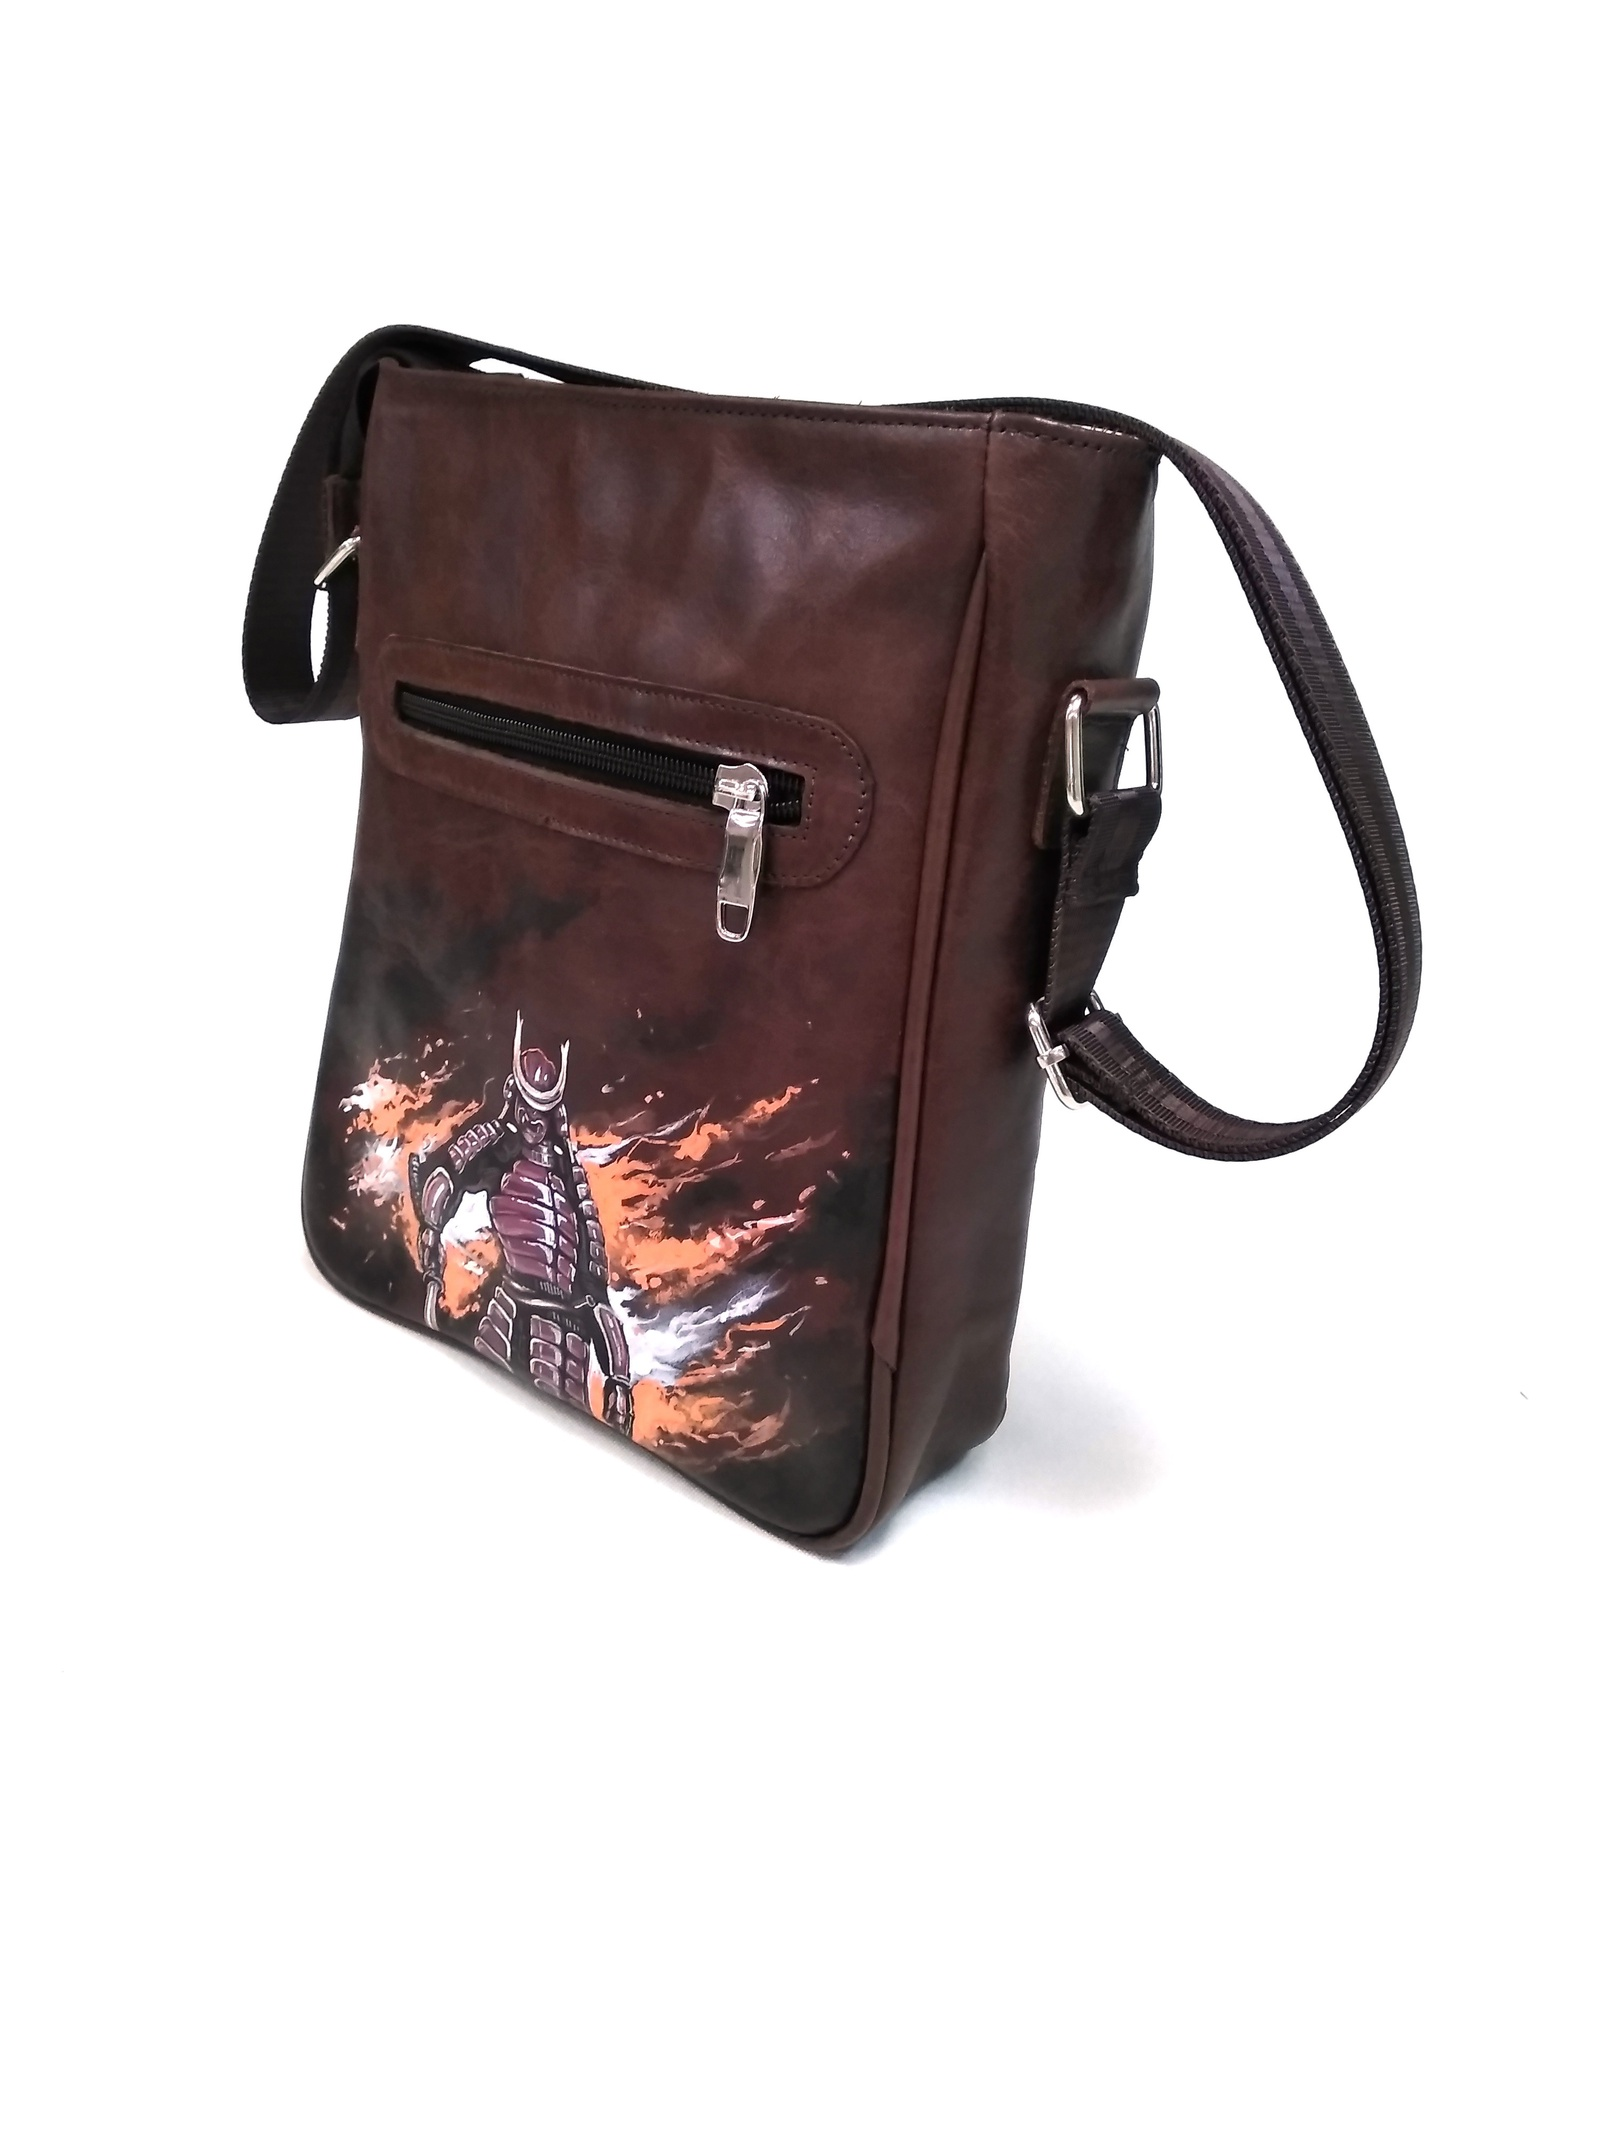 Сумка на плечо Autopremium сумка-планшет, 770000, коричневый цена